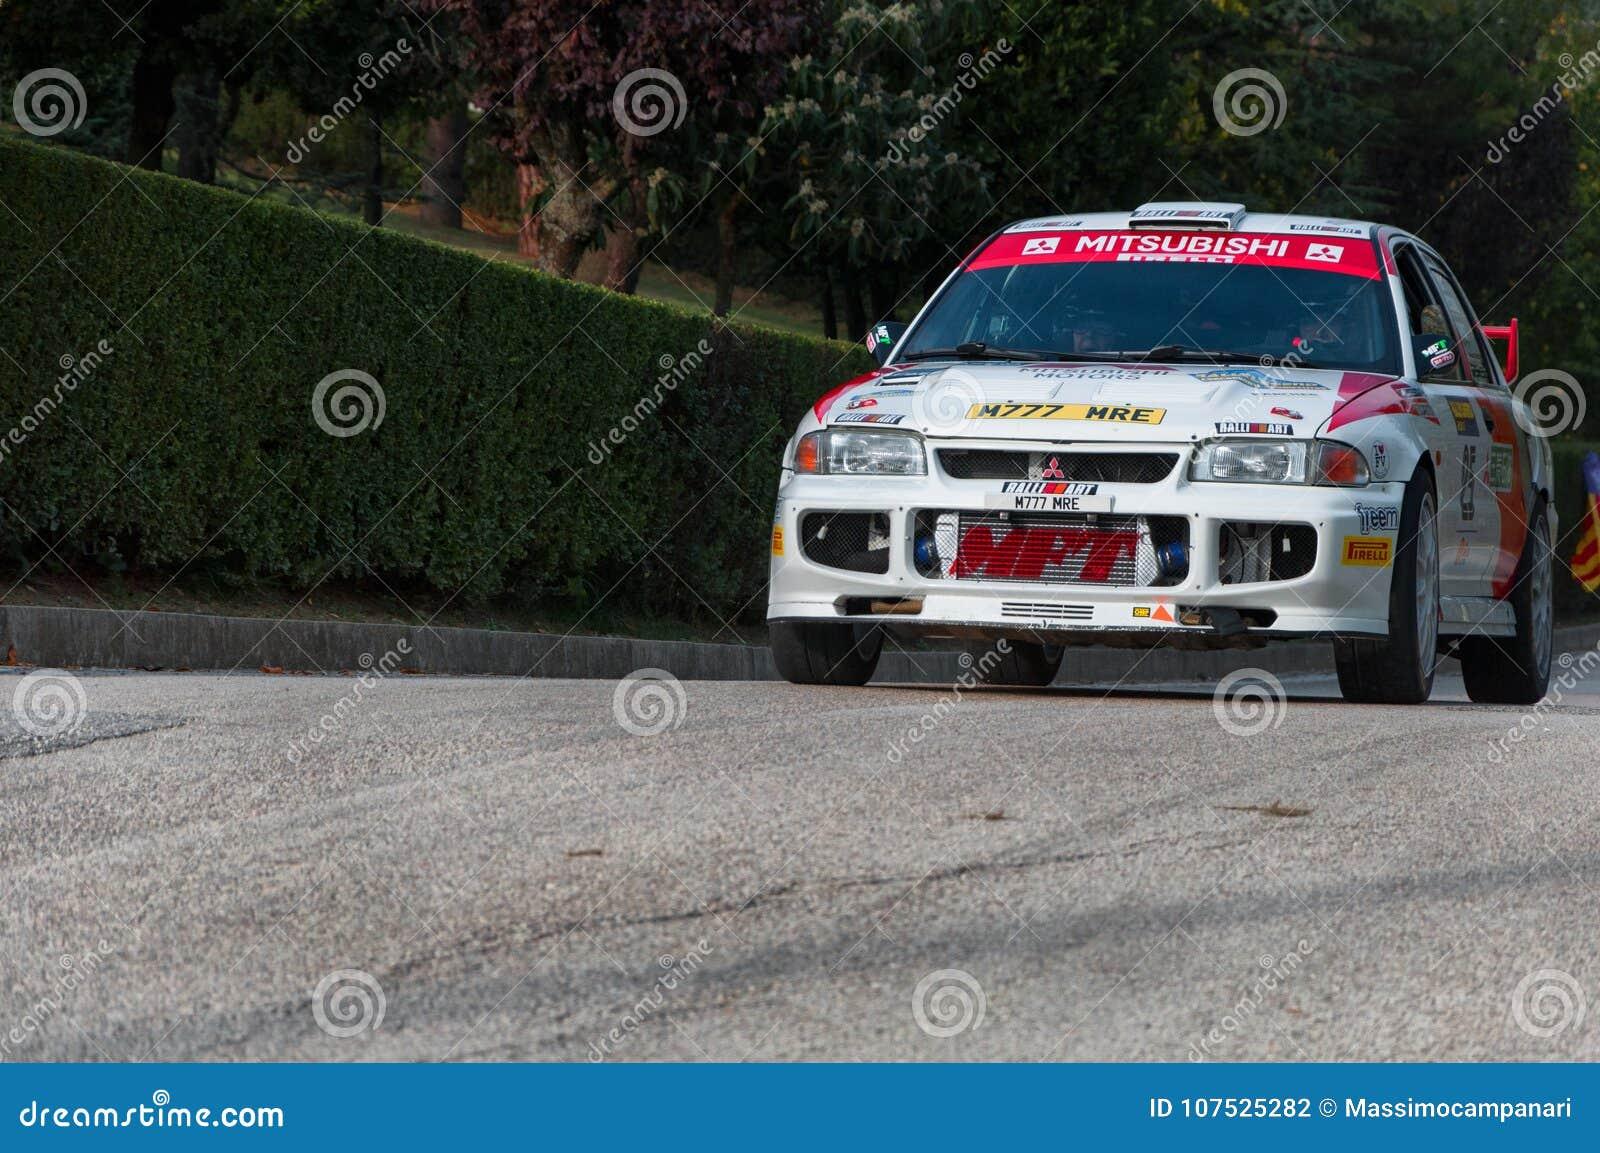 Mitsubishi Lancer Evo Iii 1995 Old Racing Car Rally The Legend 2017